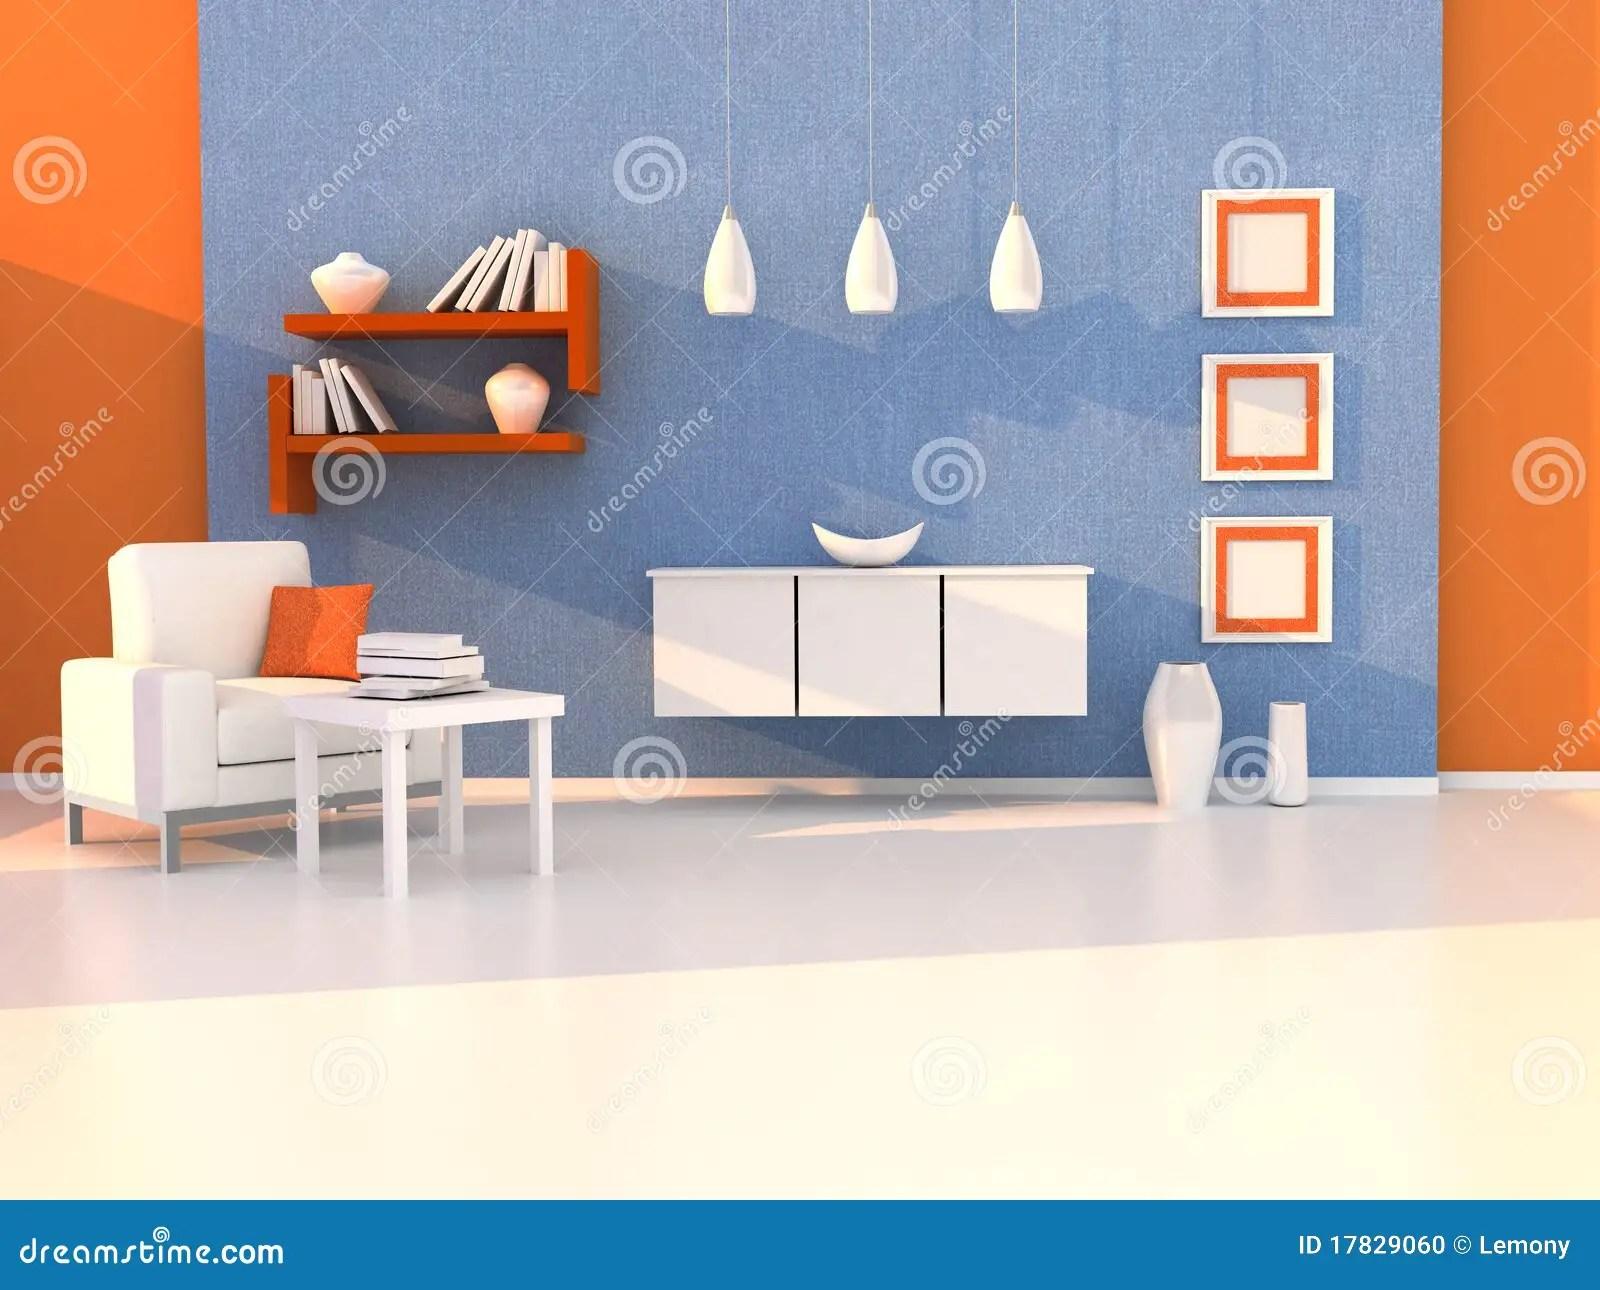 Interior Of The Modern Room Study Room Stock Photo